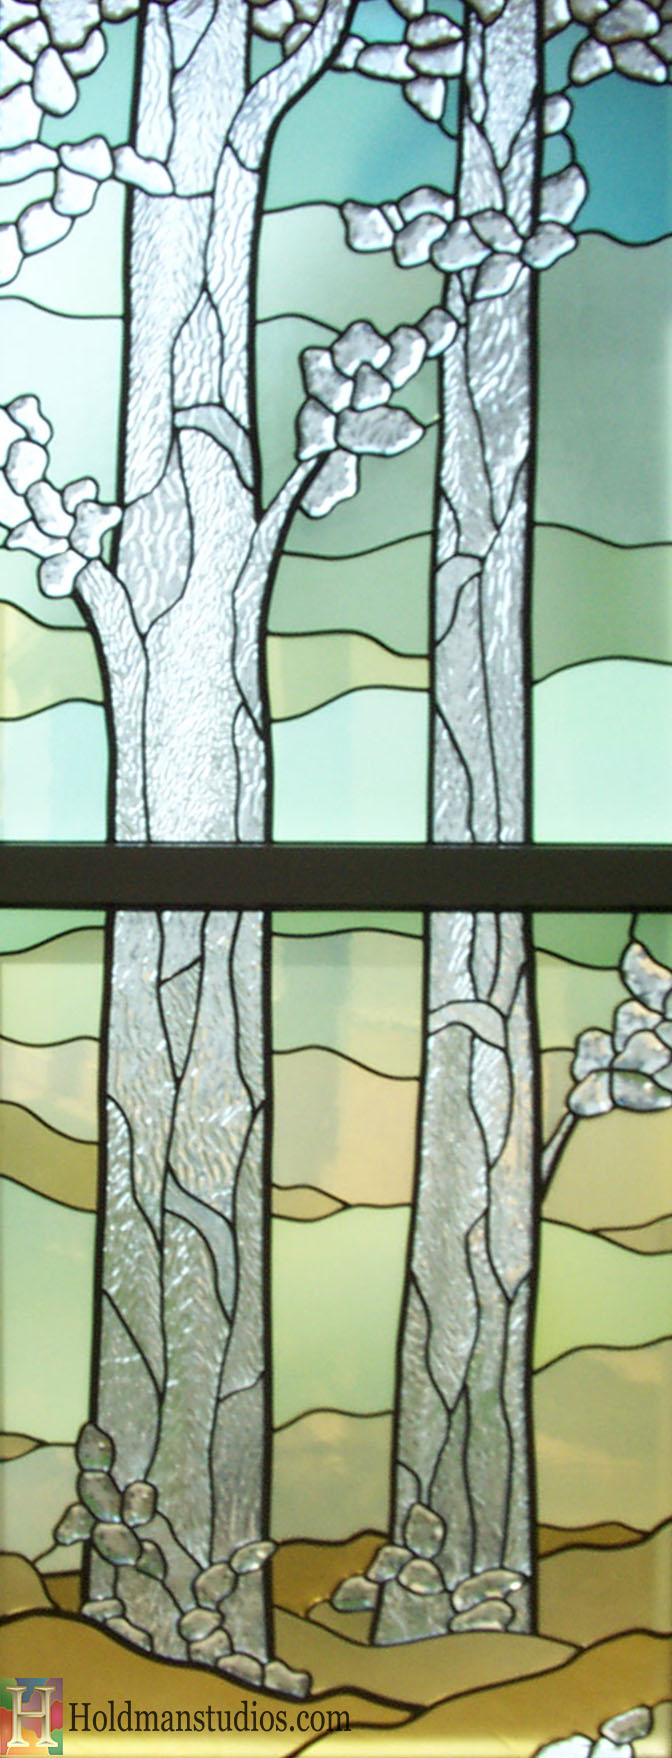 Holdman_Studios_Stained_Art_Glass_LDS_Mormon_Palmyra_New_York_Temple_Sacred_Grove_Tree_of_Life_Window_Panels.jpg